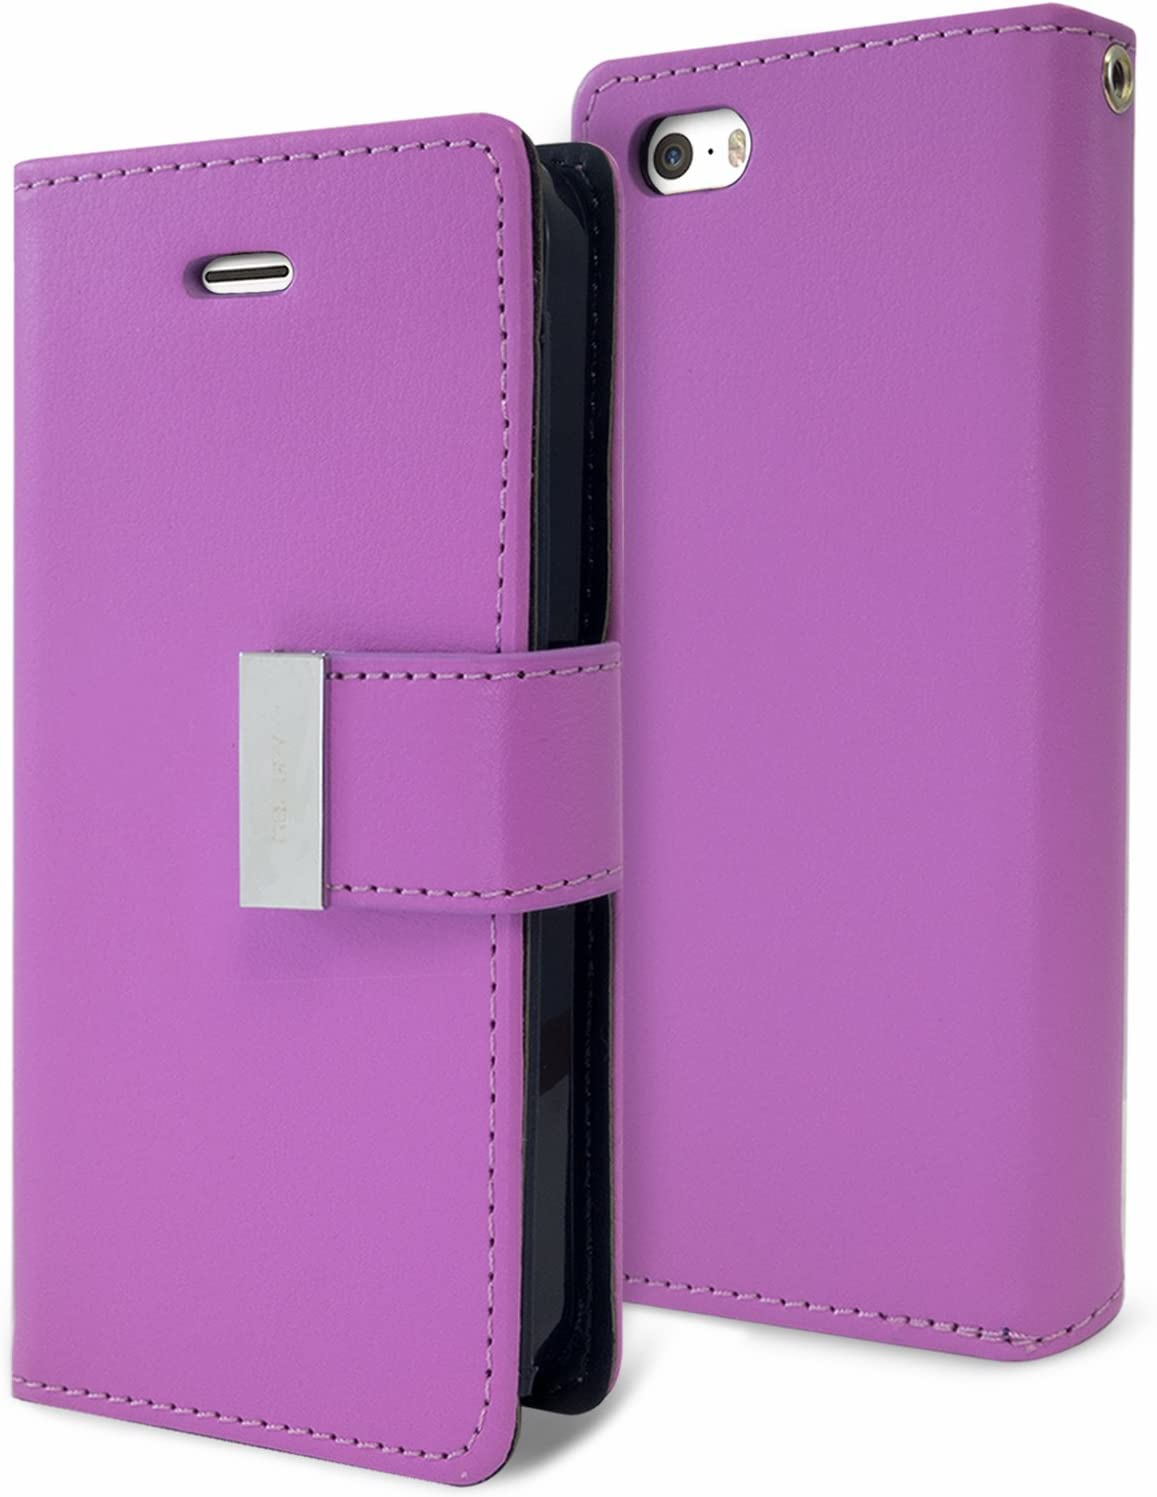 Goospery Rich Wallet for Apple iPhone SE Case (2016) iPhone 5S Case (2013) iPhone 5 Case (2012) Extra Card Slots Leather Flip Cover (Purple) IP5-RIC-PPL